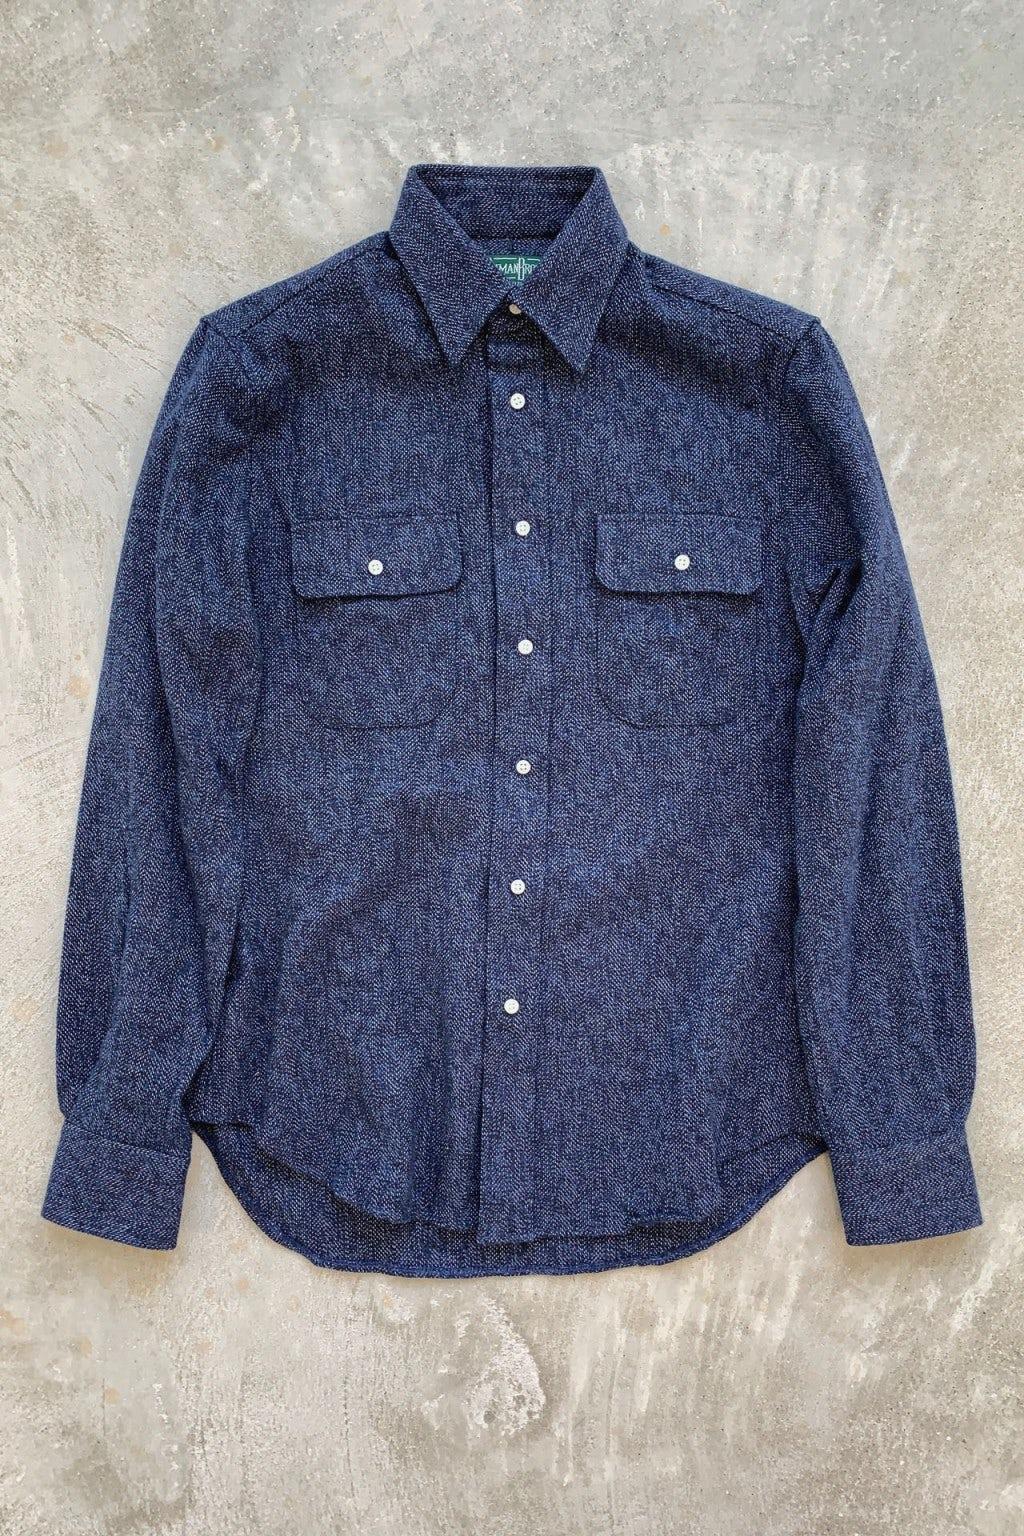 Gitman Bros. Vintage Longsleeve Button Down Navy Cotton Tweed